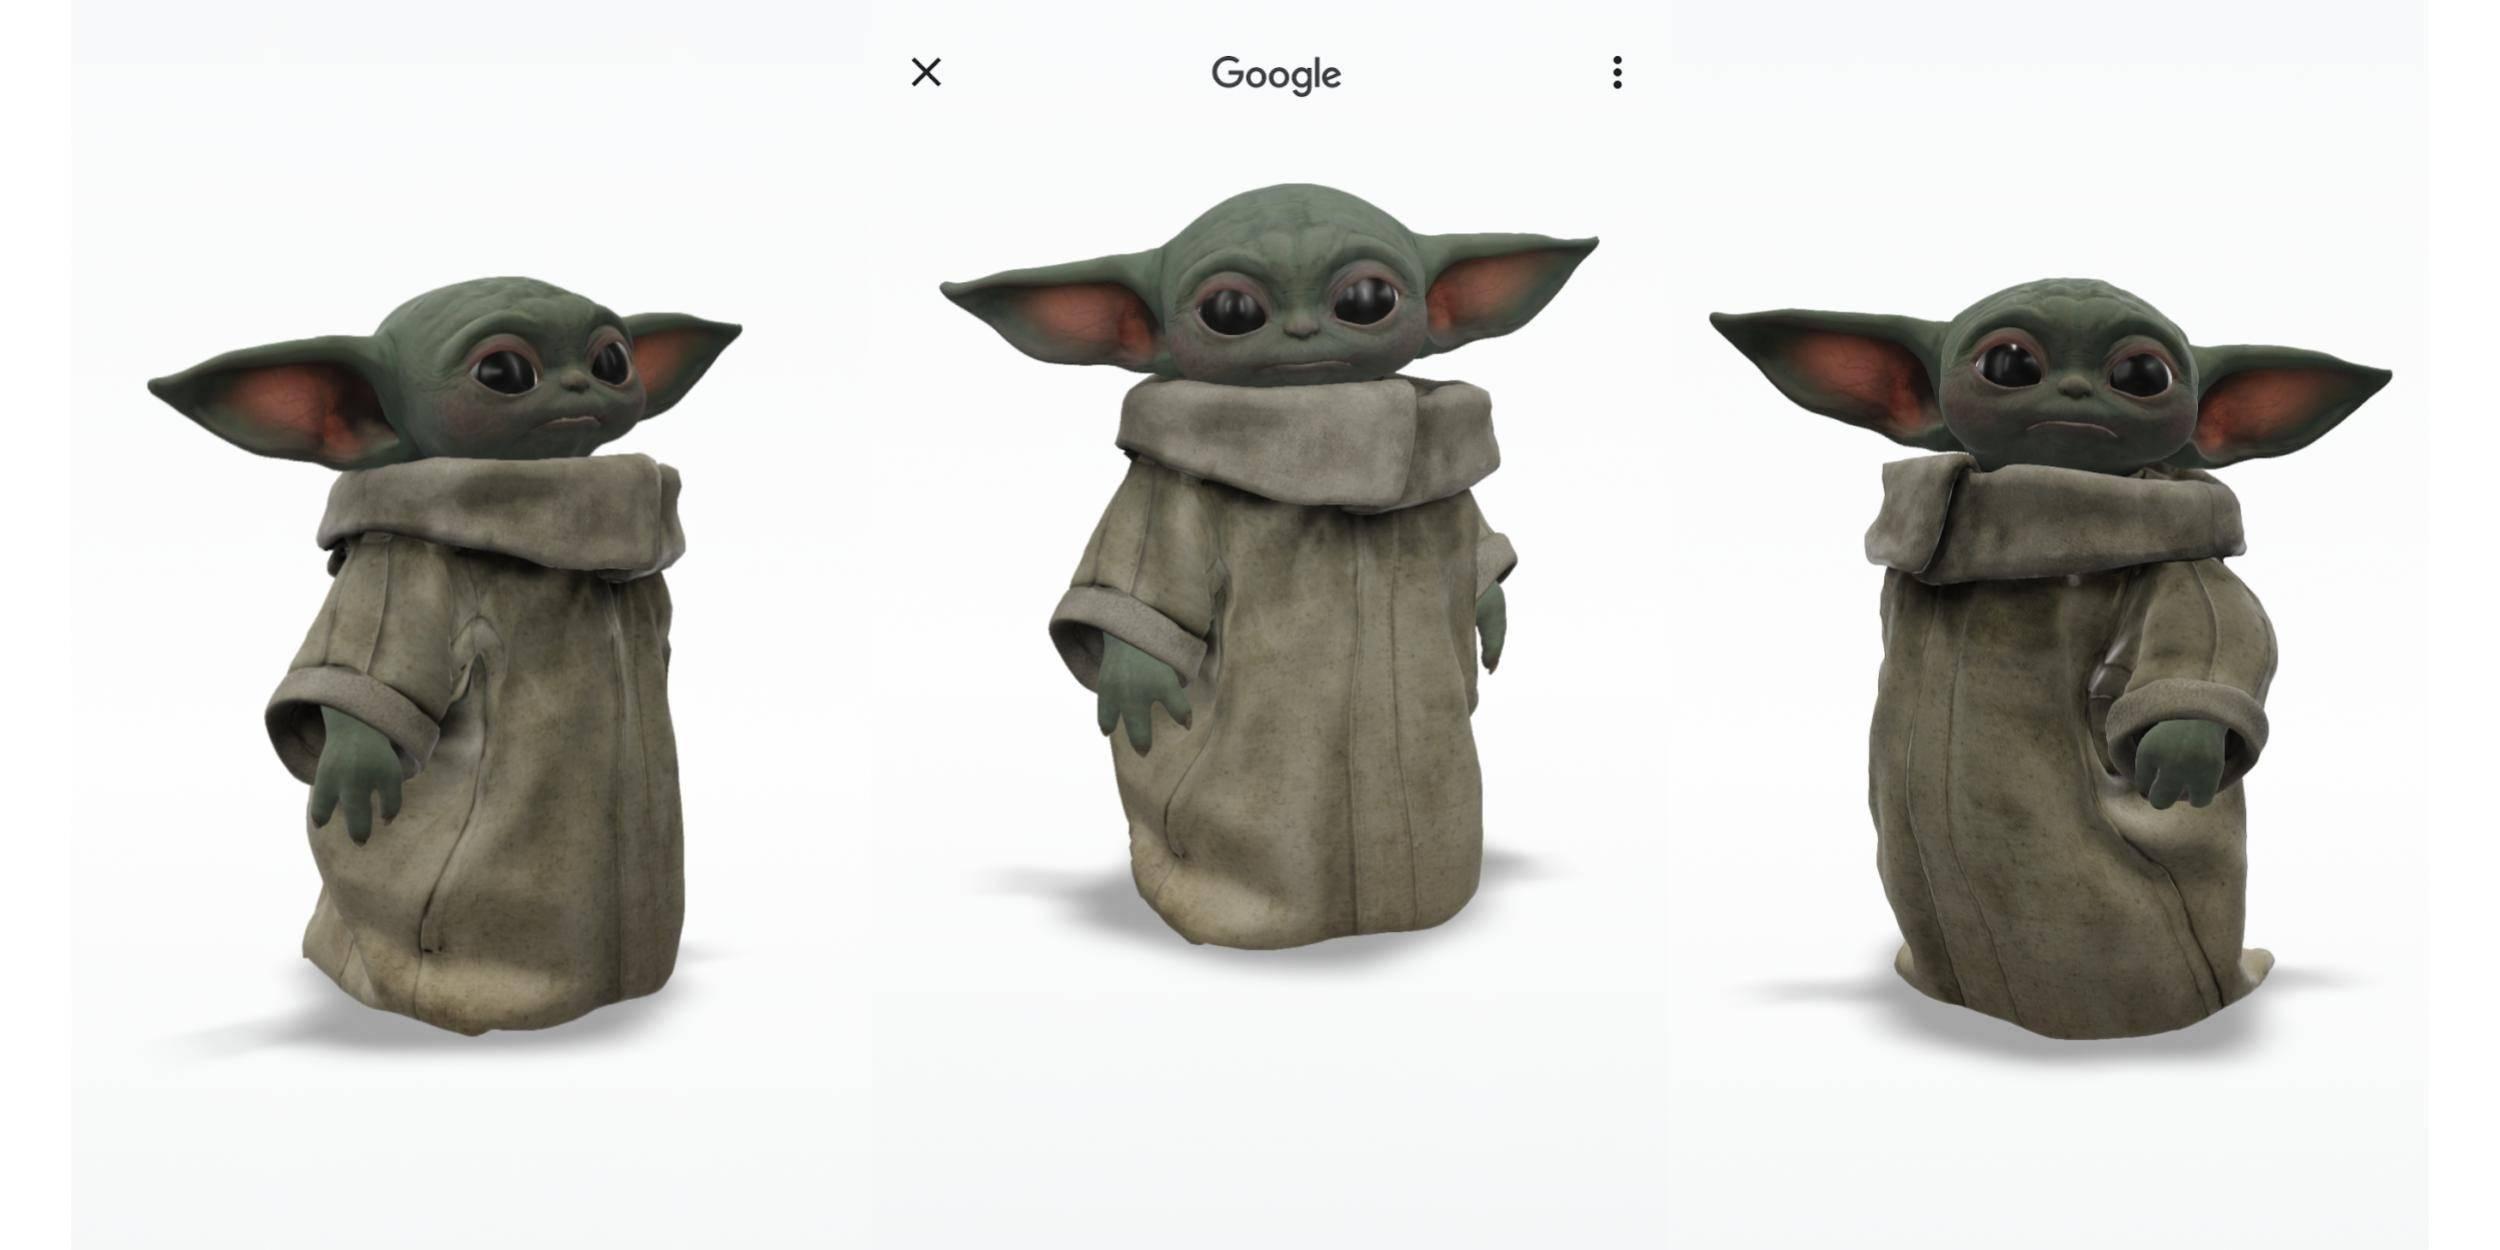 Grogu Google